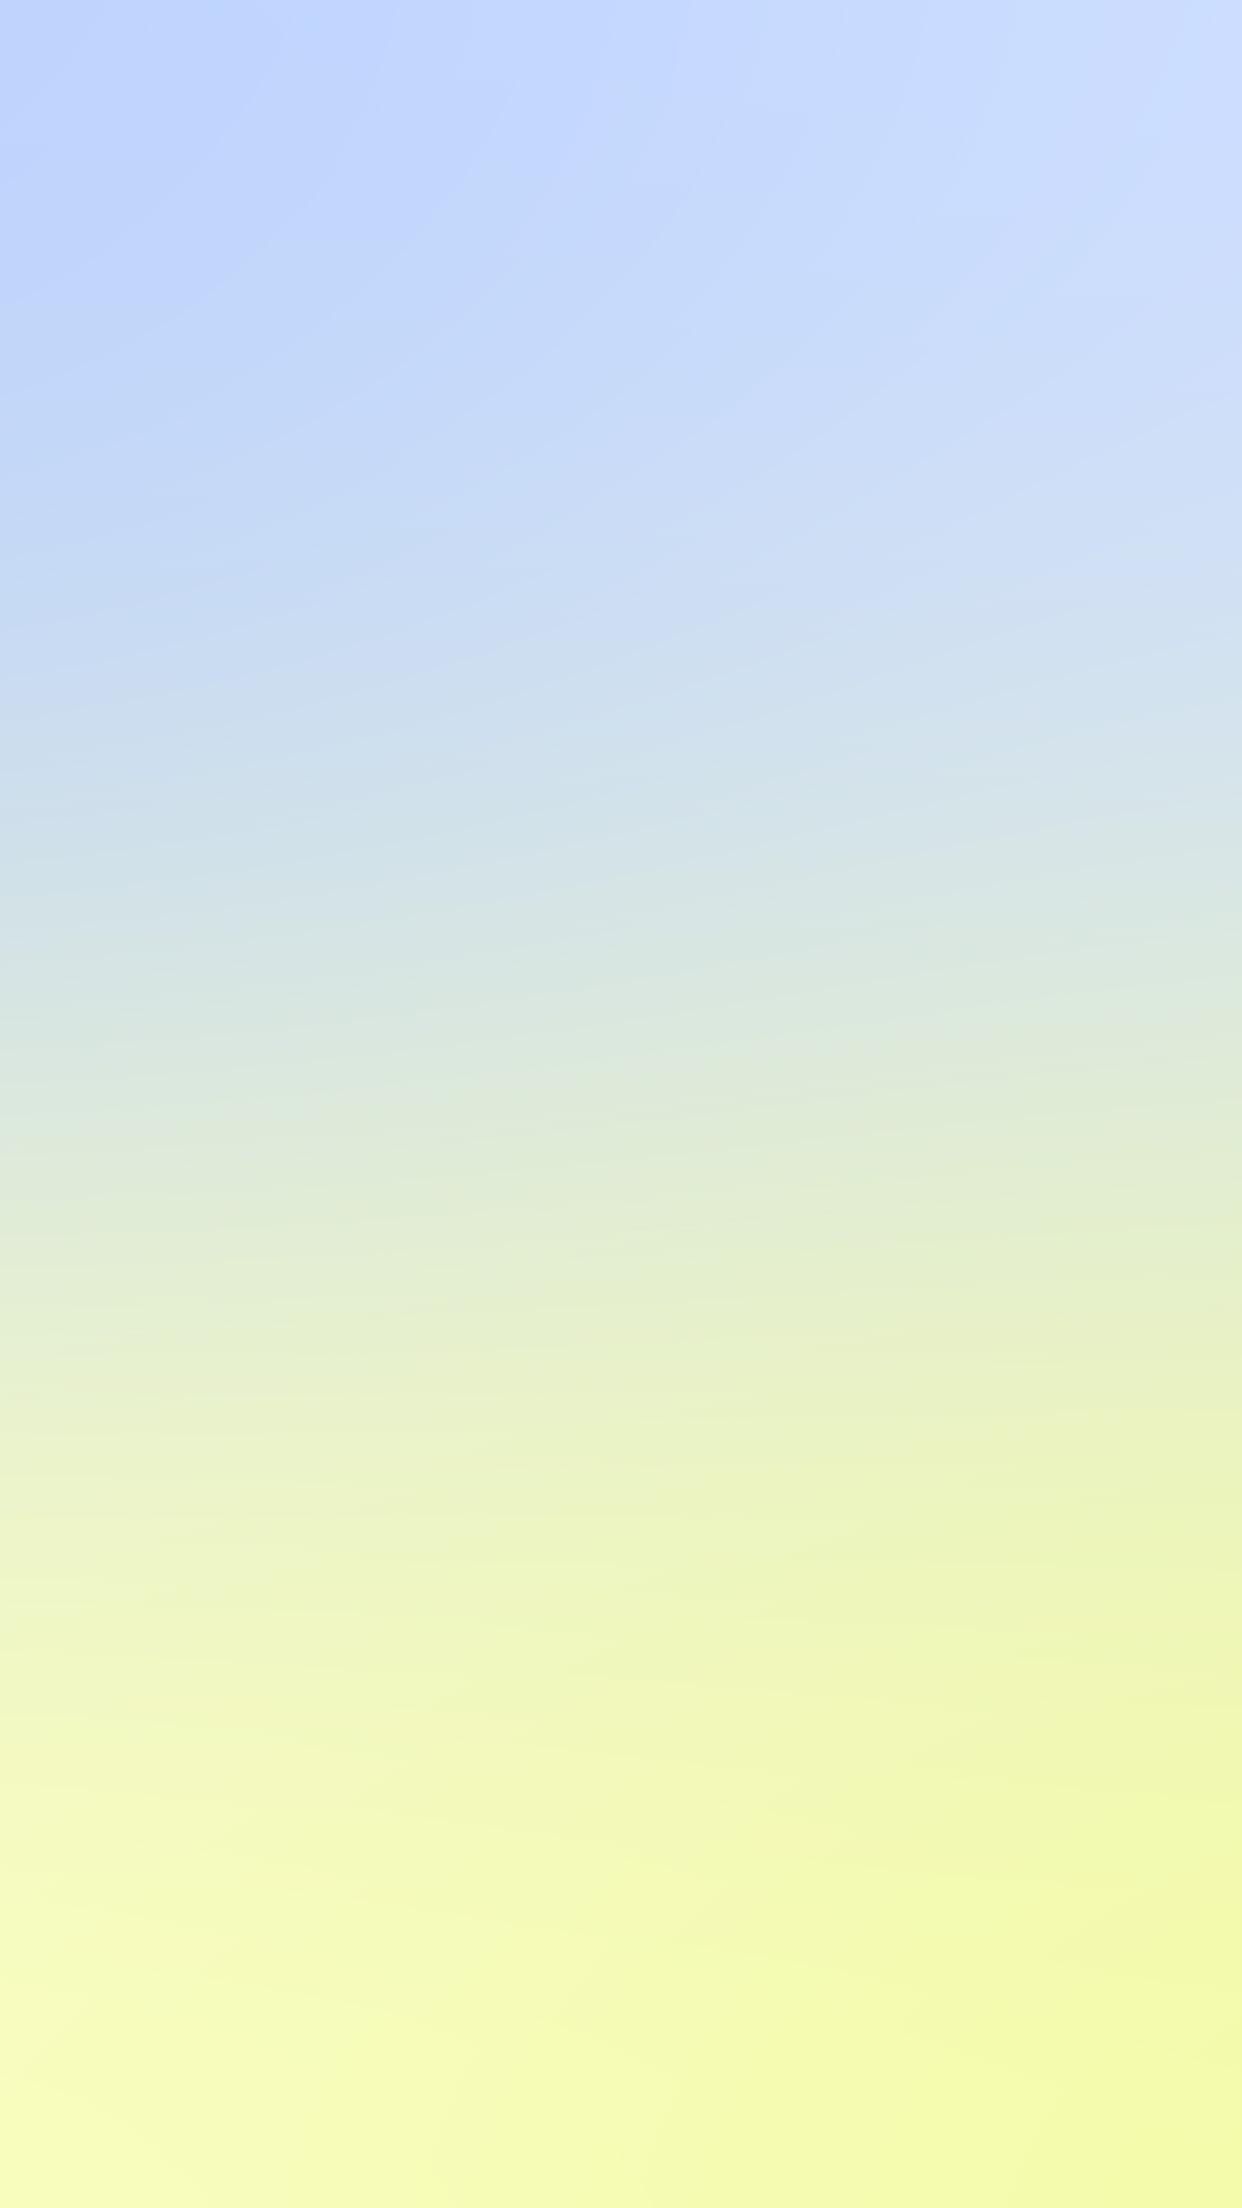 Iphone6paperscom Iphone 6 Wallpaper Sn86 Light Yellow